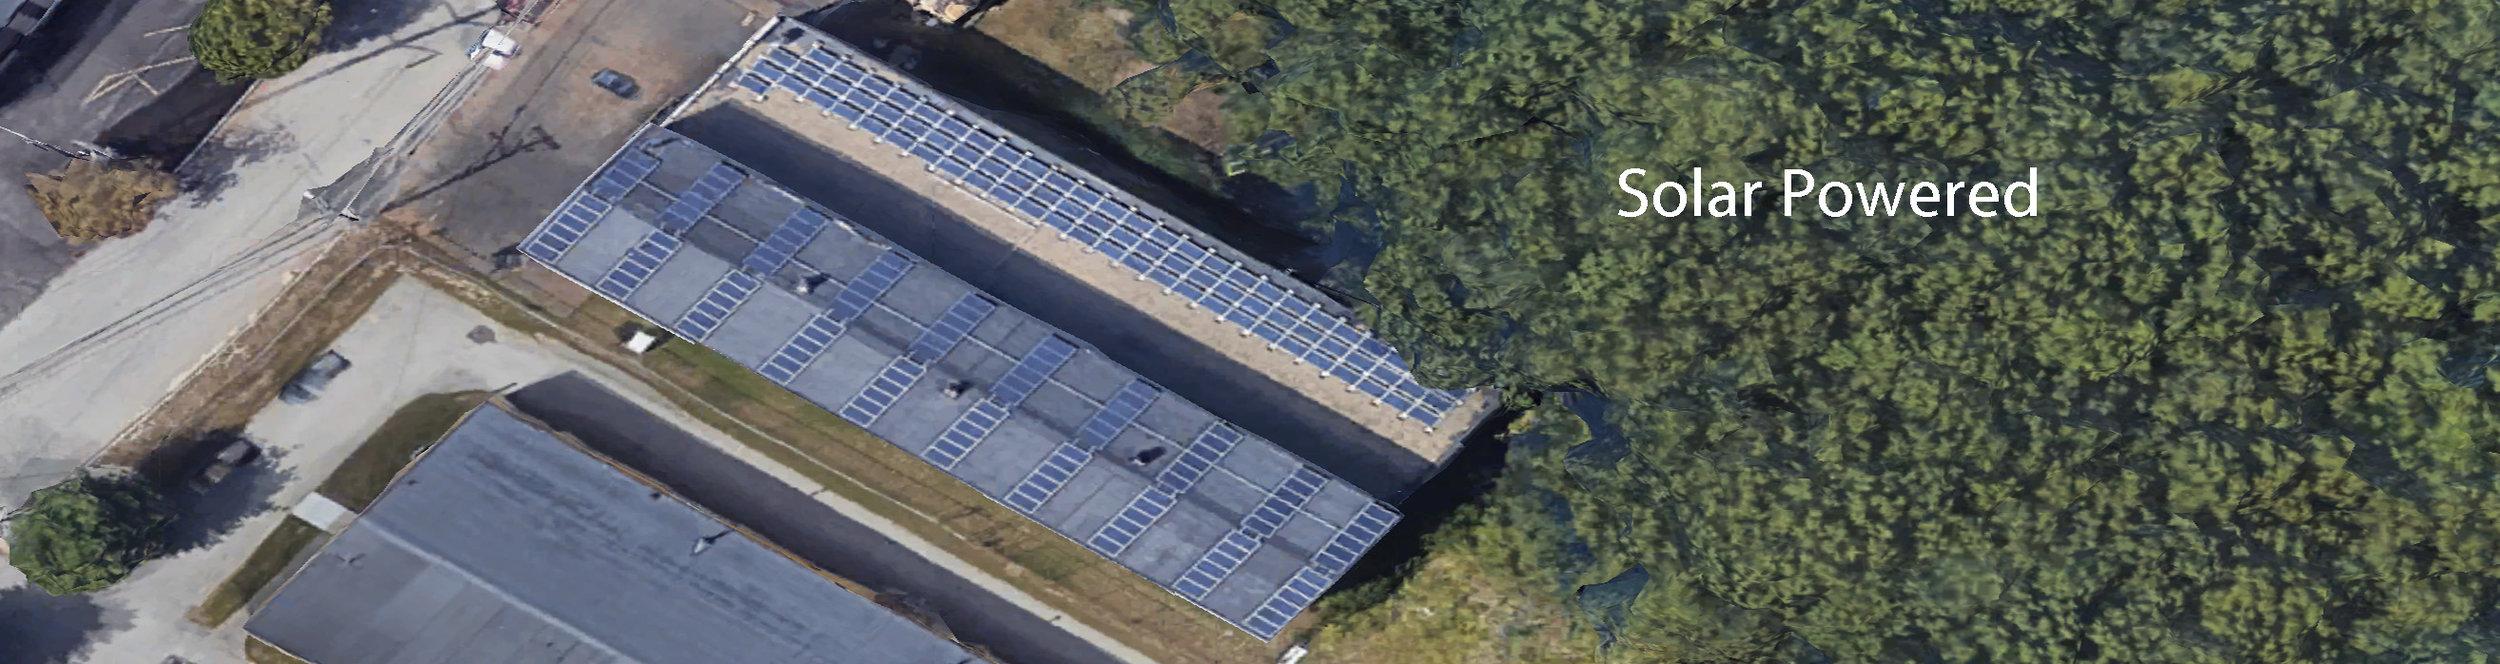 Solar Powered.jpg